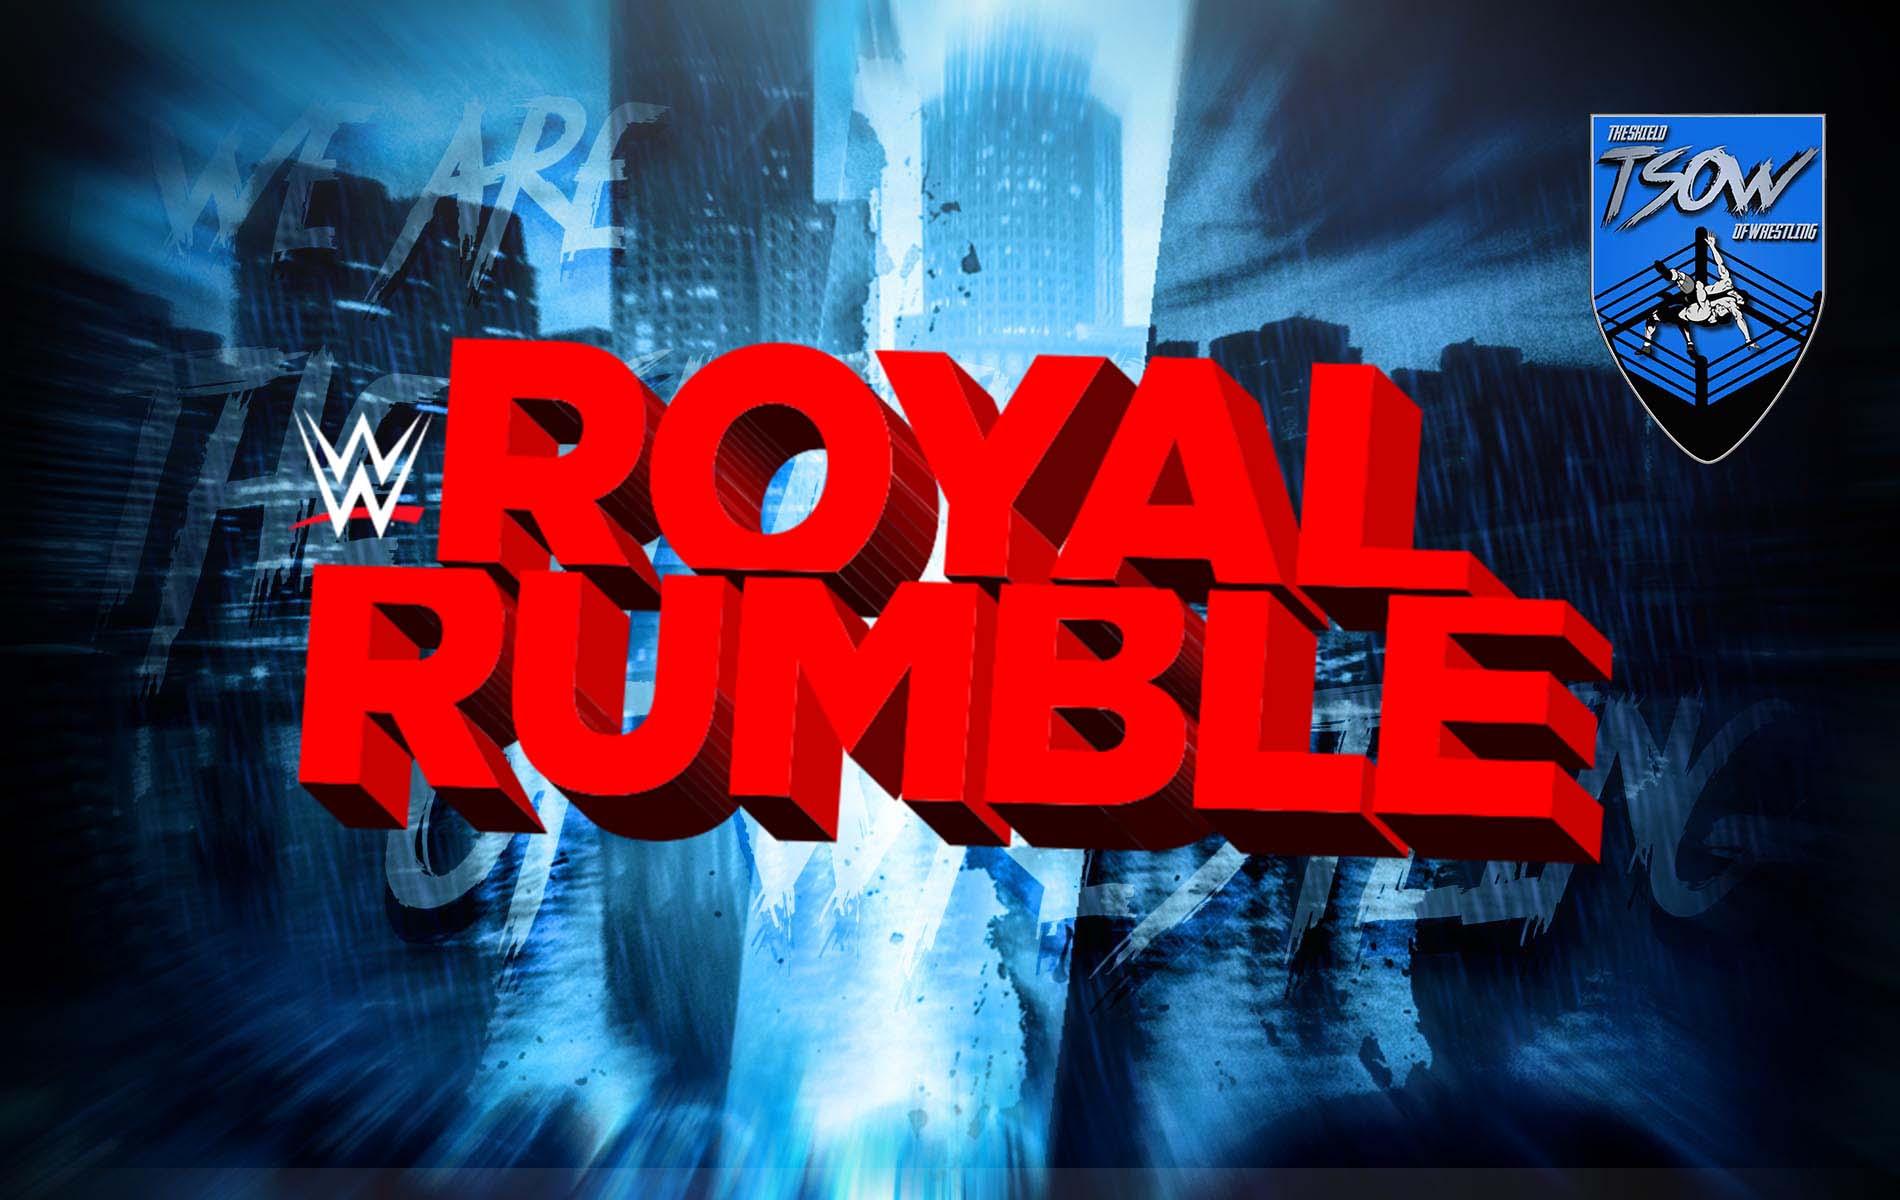 WWE Royal Rumble 2021: svelati i primi due entranti sul ring!